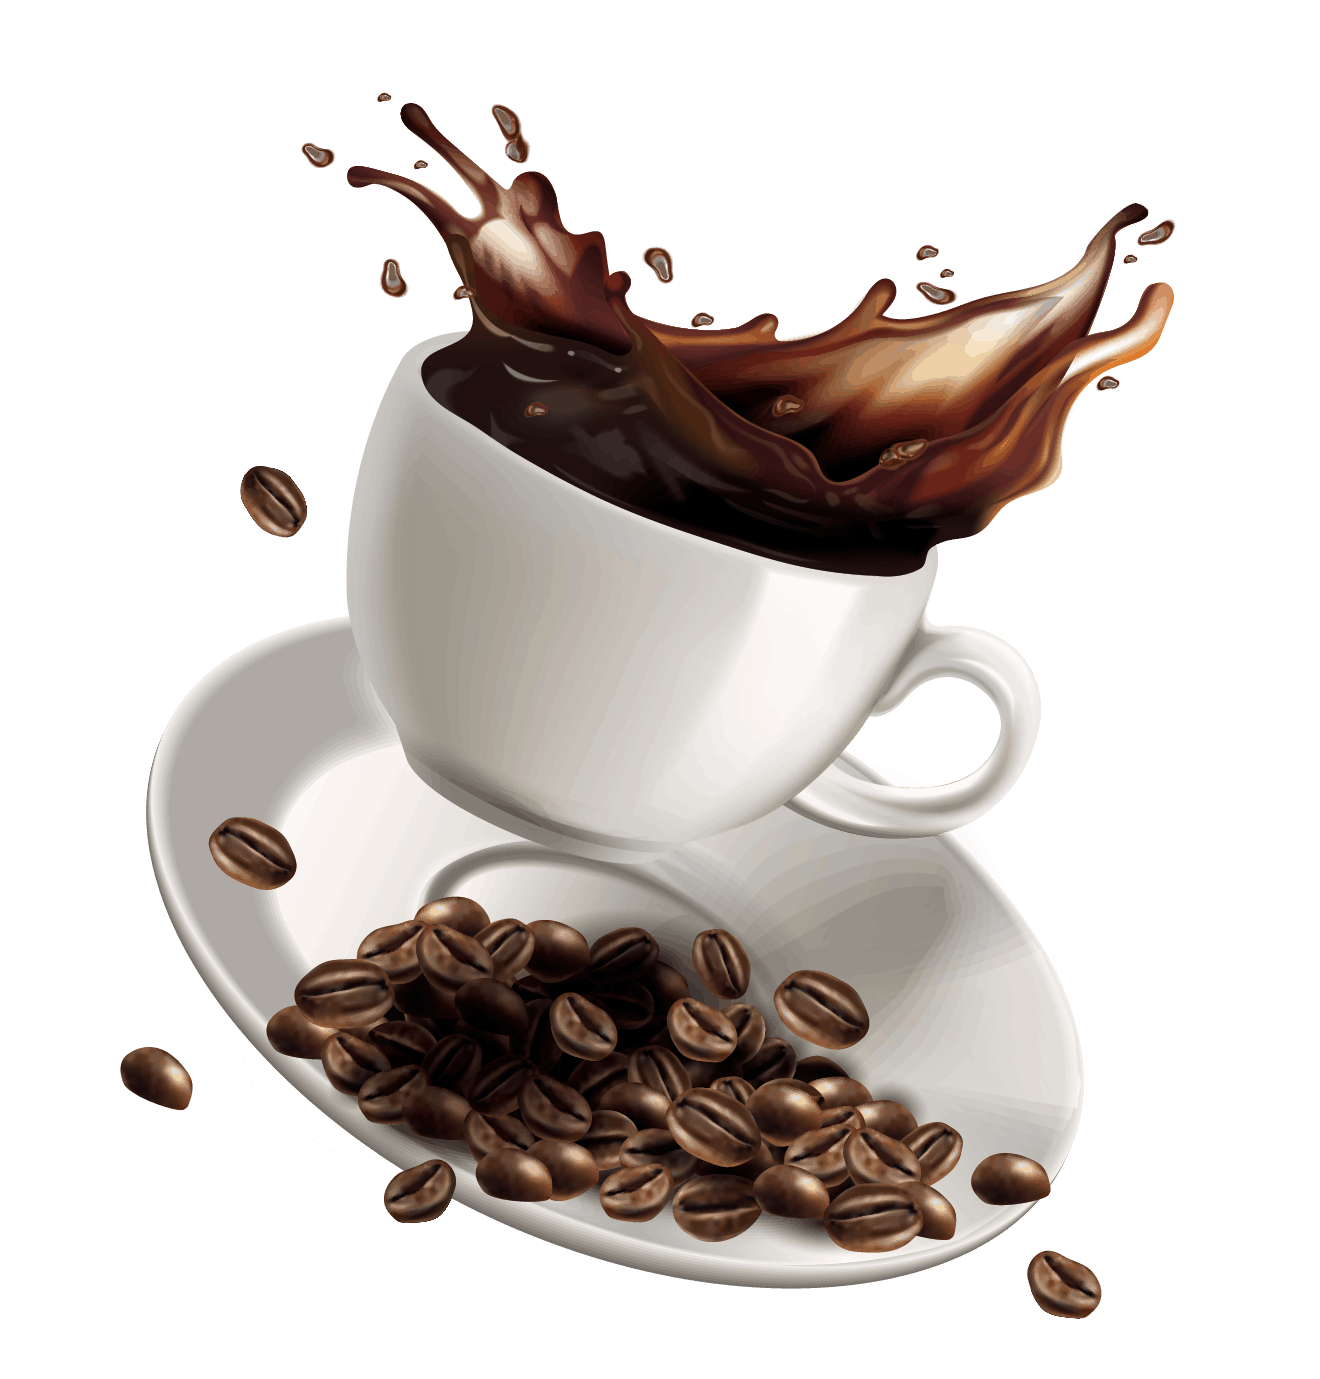 coffee-spill